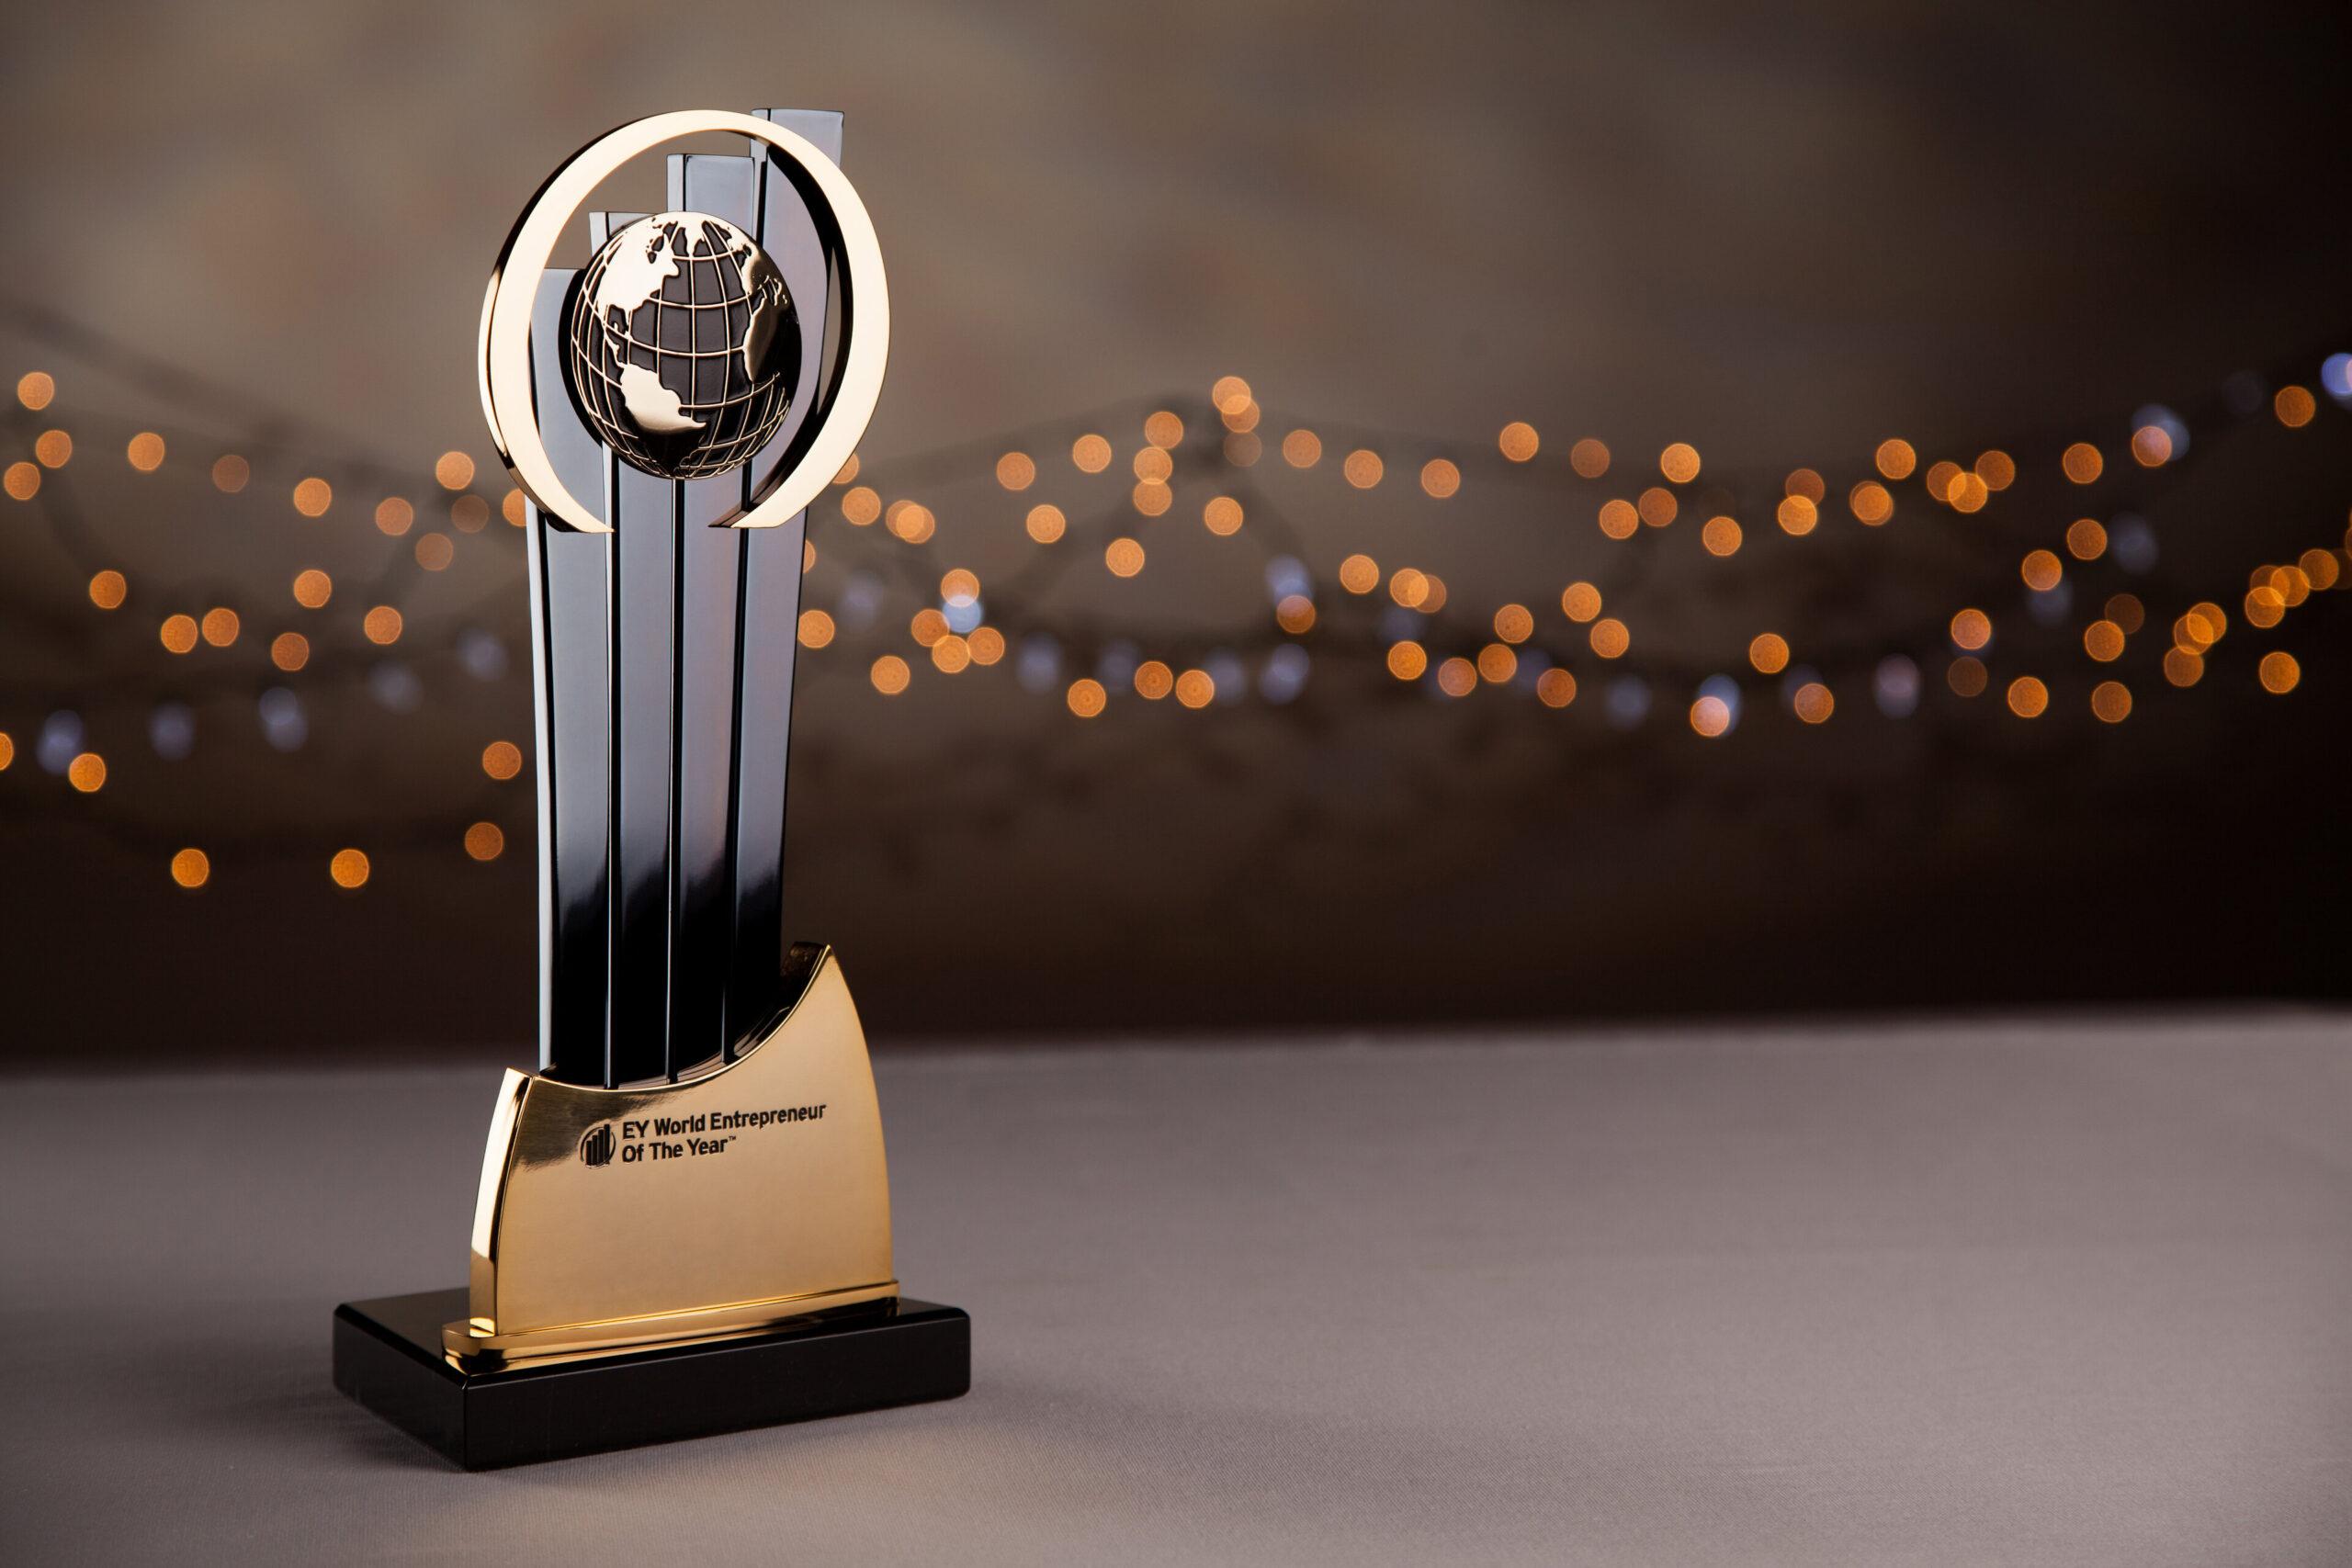 Skyrora CEO Volodymyr Levykin is Announced as Finalist in EY Entrepreneur of the Year 2021 Awards